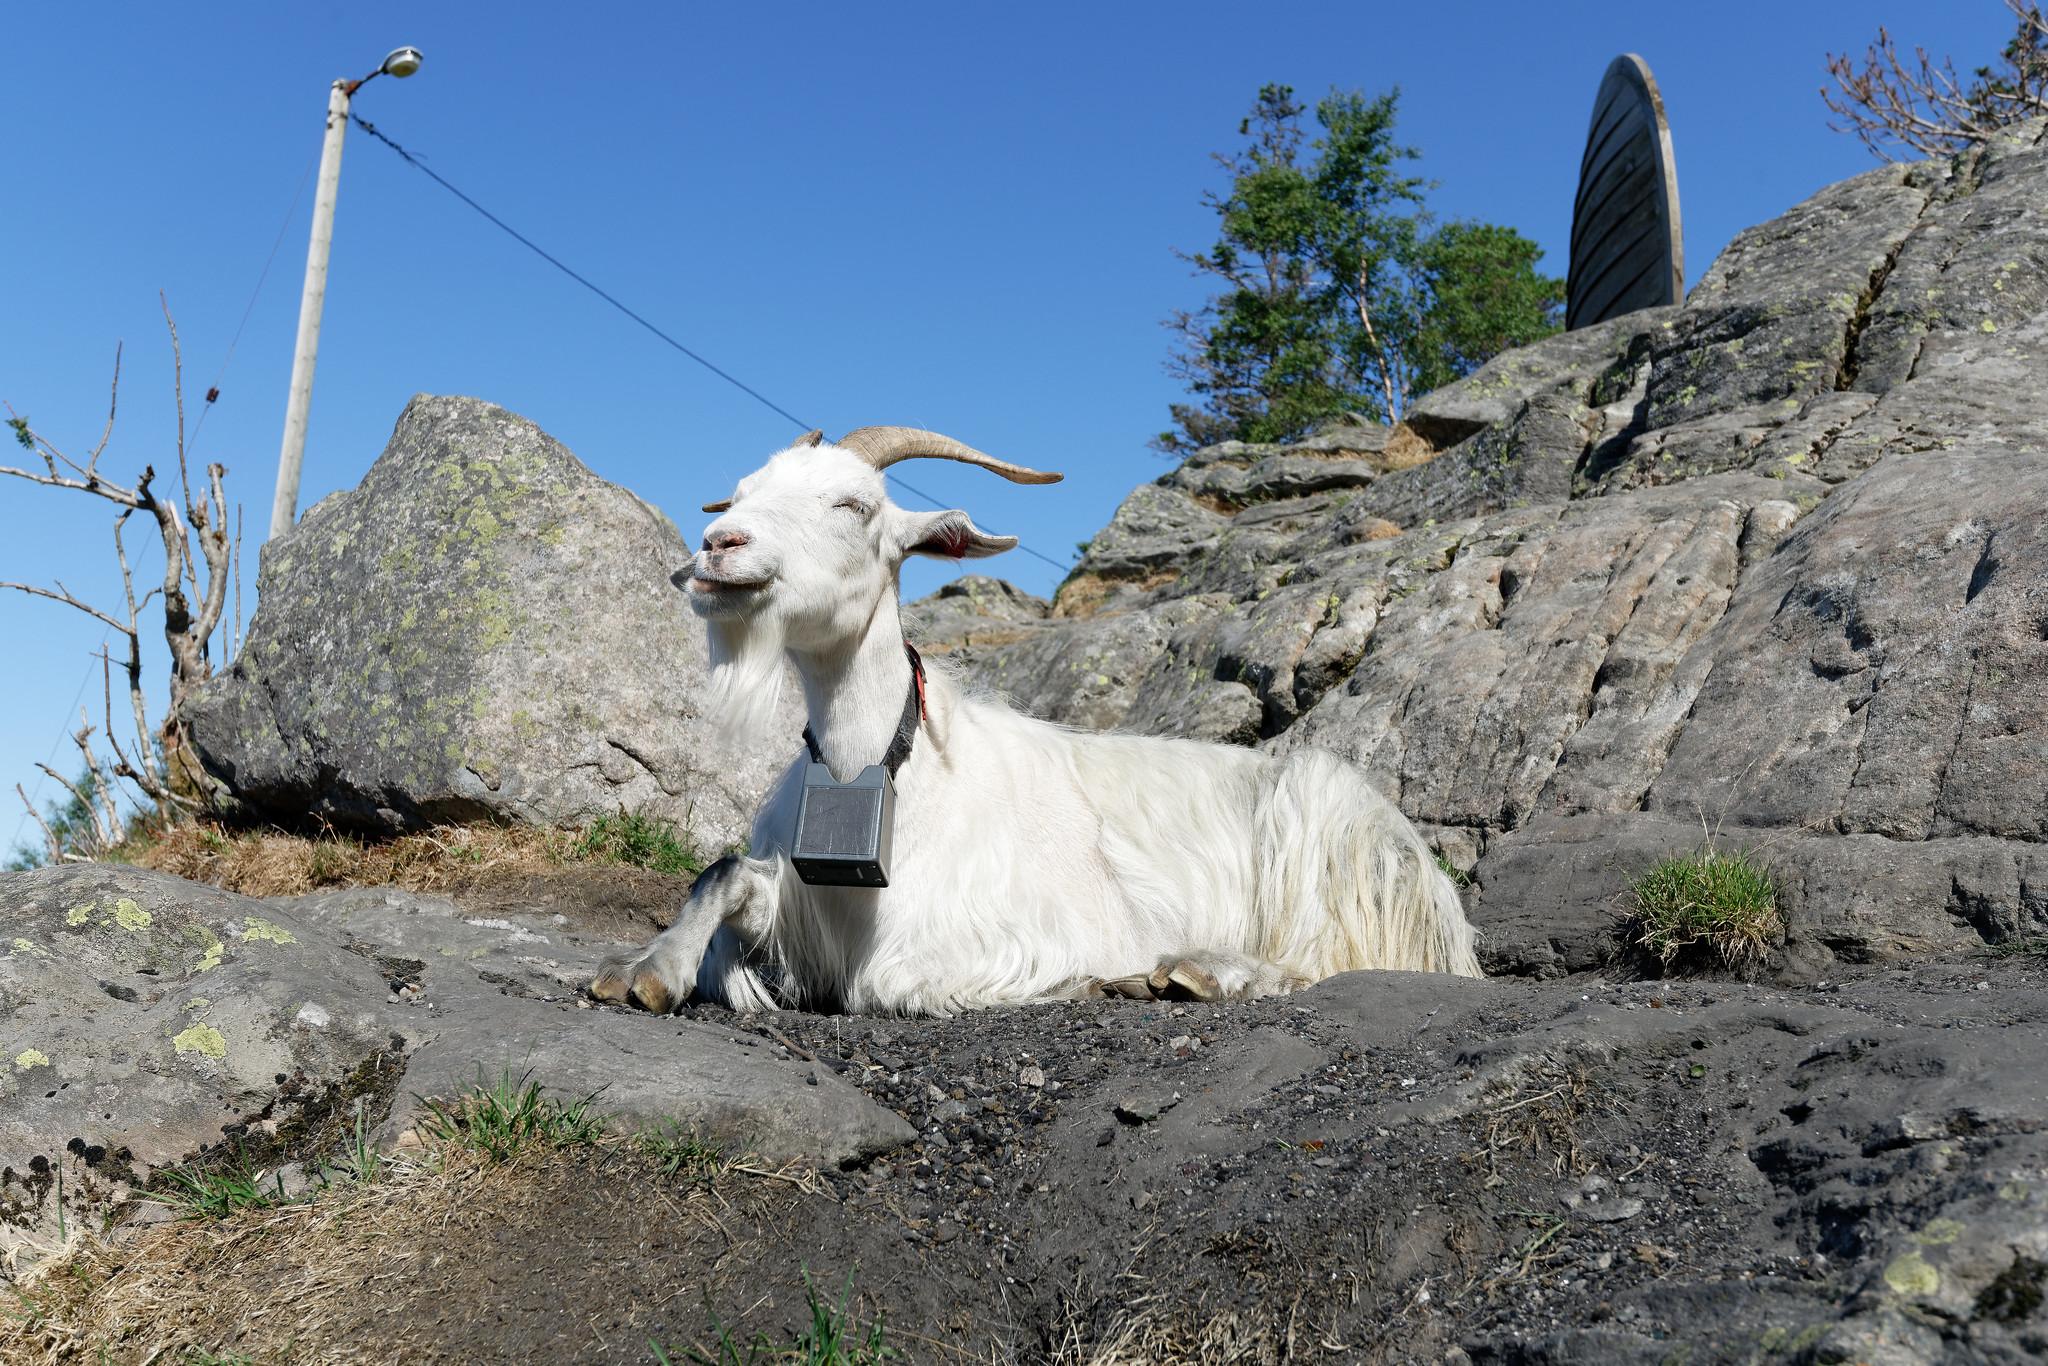 Goat On Mount Fløyen